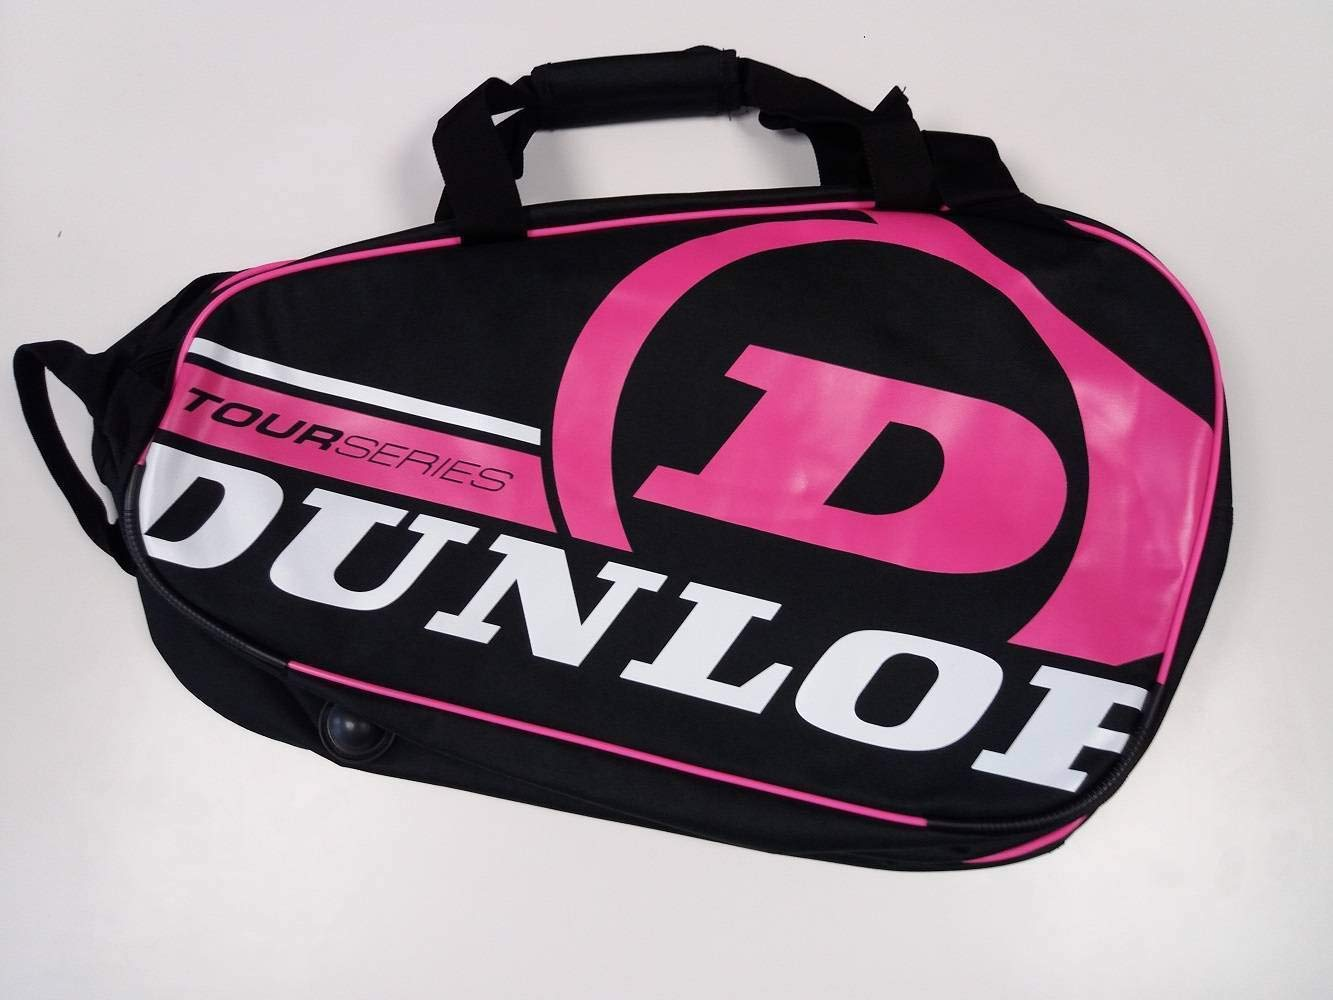 Paletero de pádel Dunlop Tour Intro Negro / Rosa: Amazon.es: Deportes y aire libre